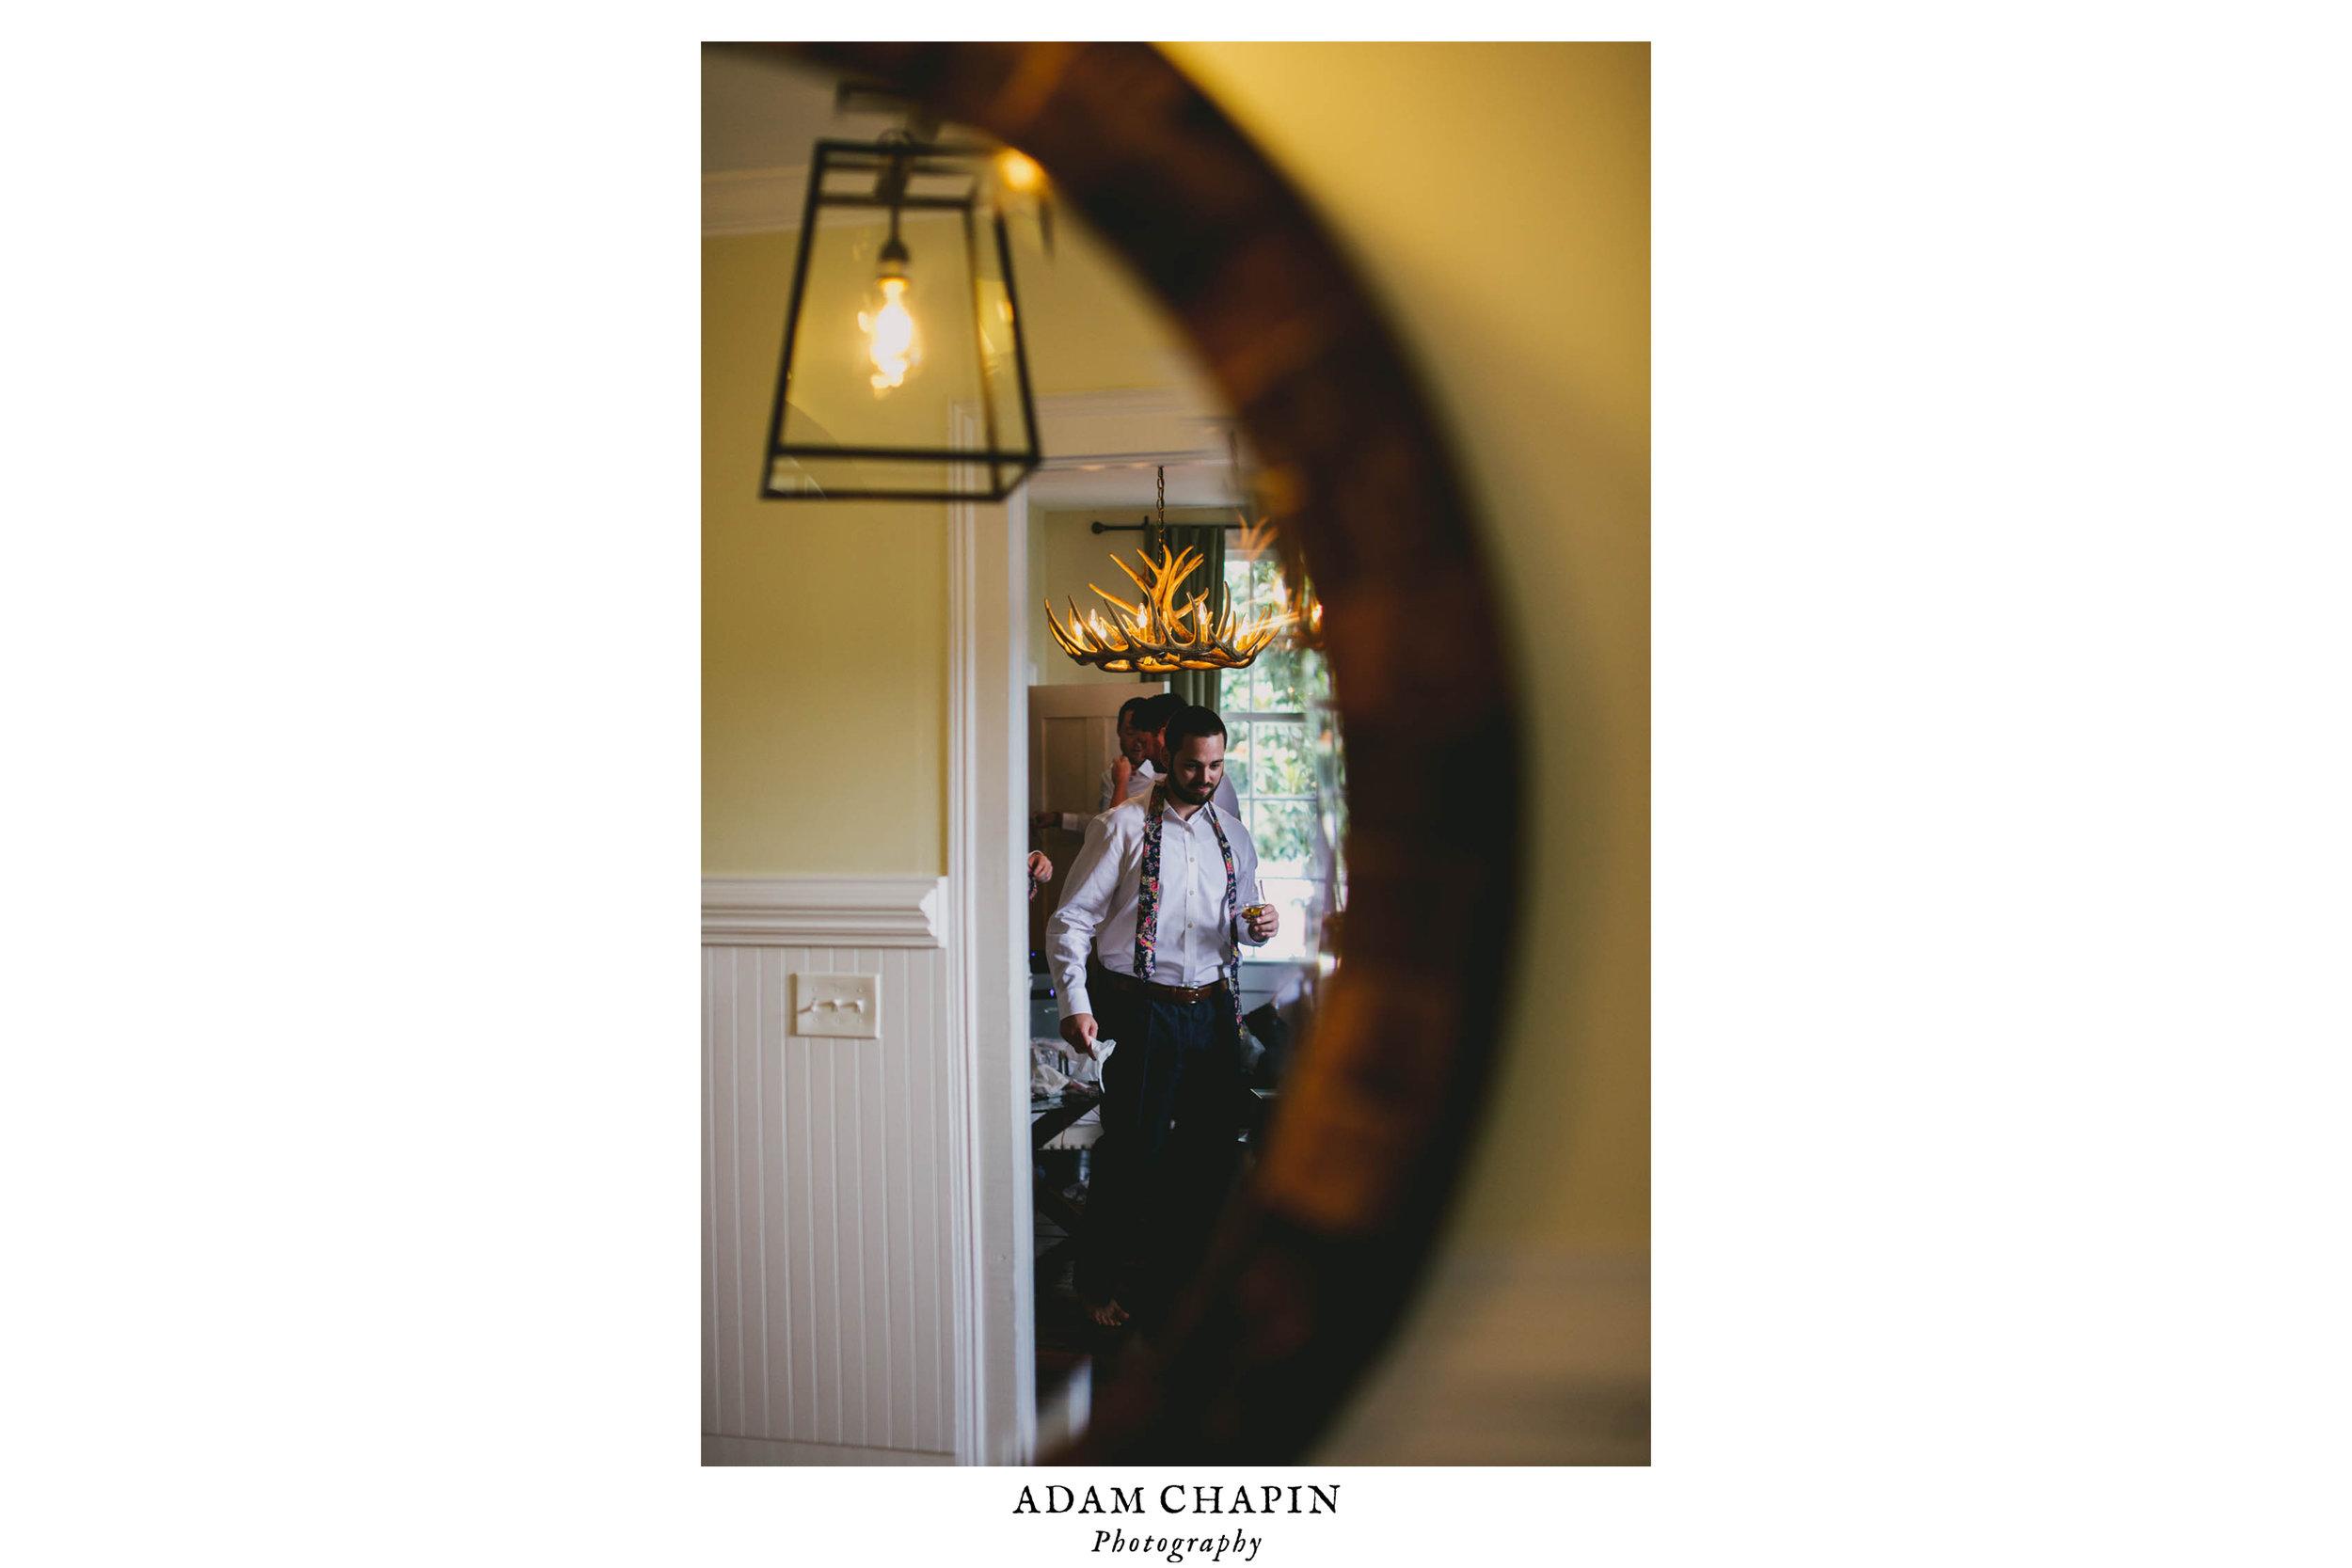 mims-house-wedding-groom-getting-ready.jpg